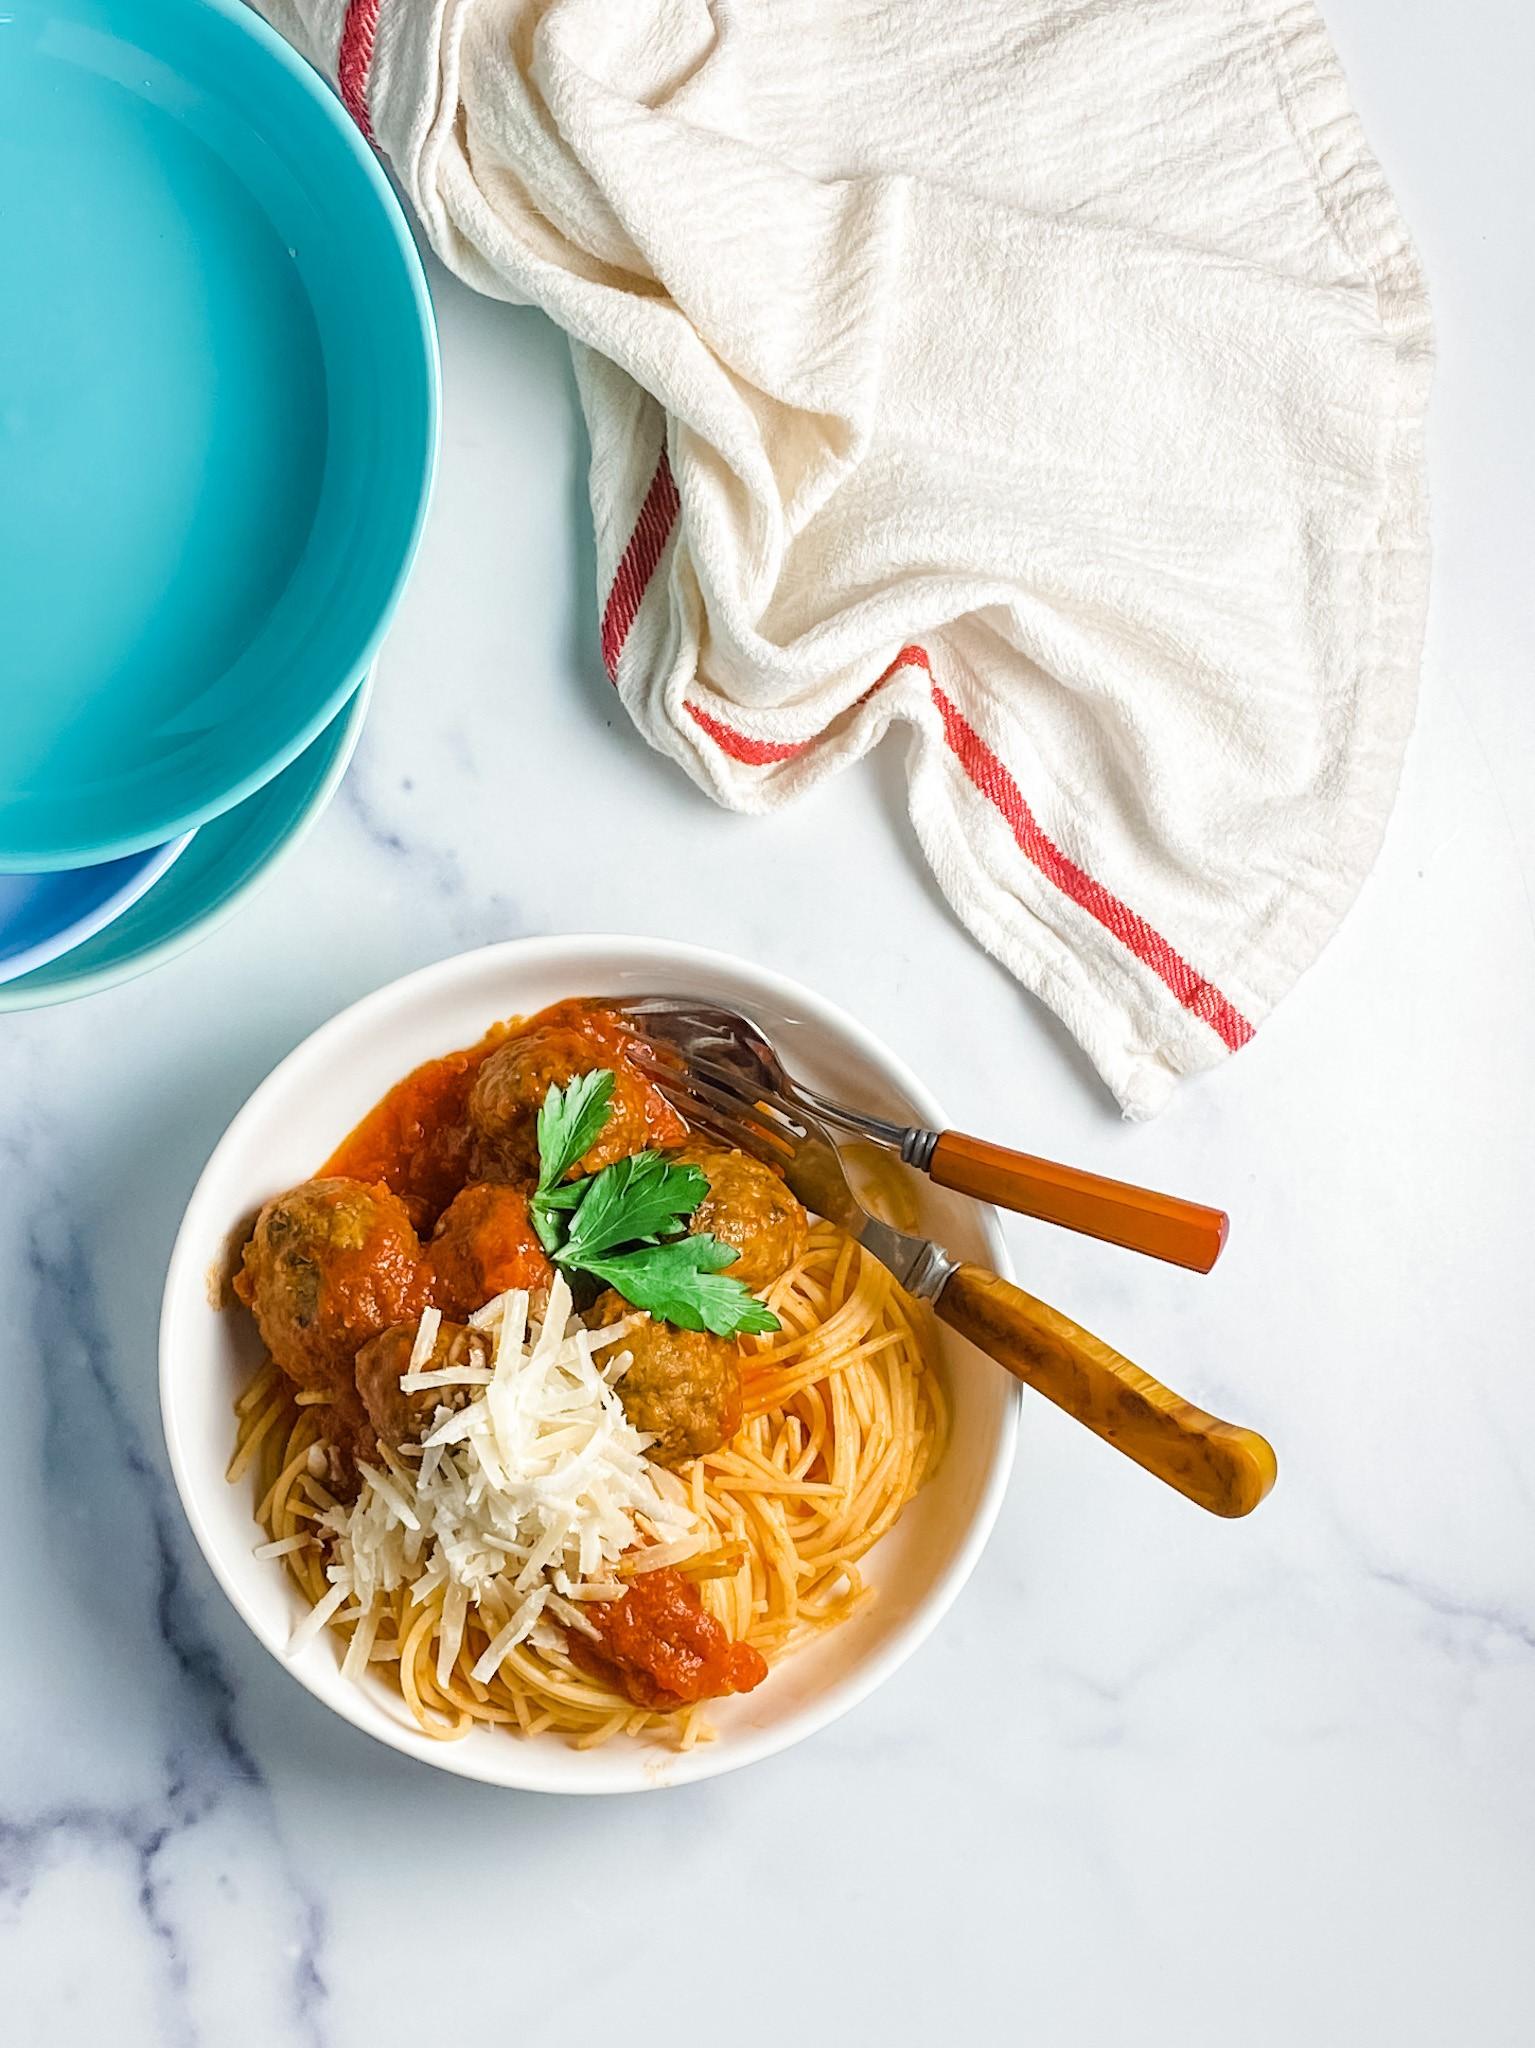 Pregistry's Friday Recipe: Easy, Mess-Free Meatballs!